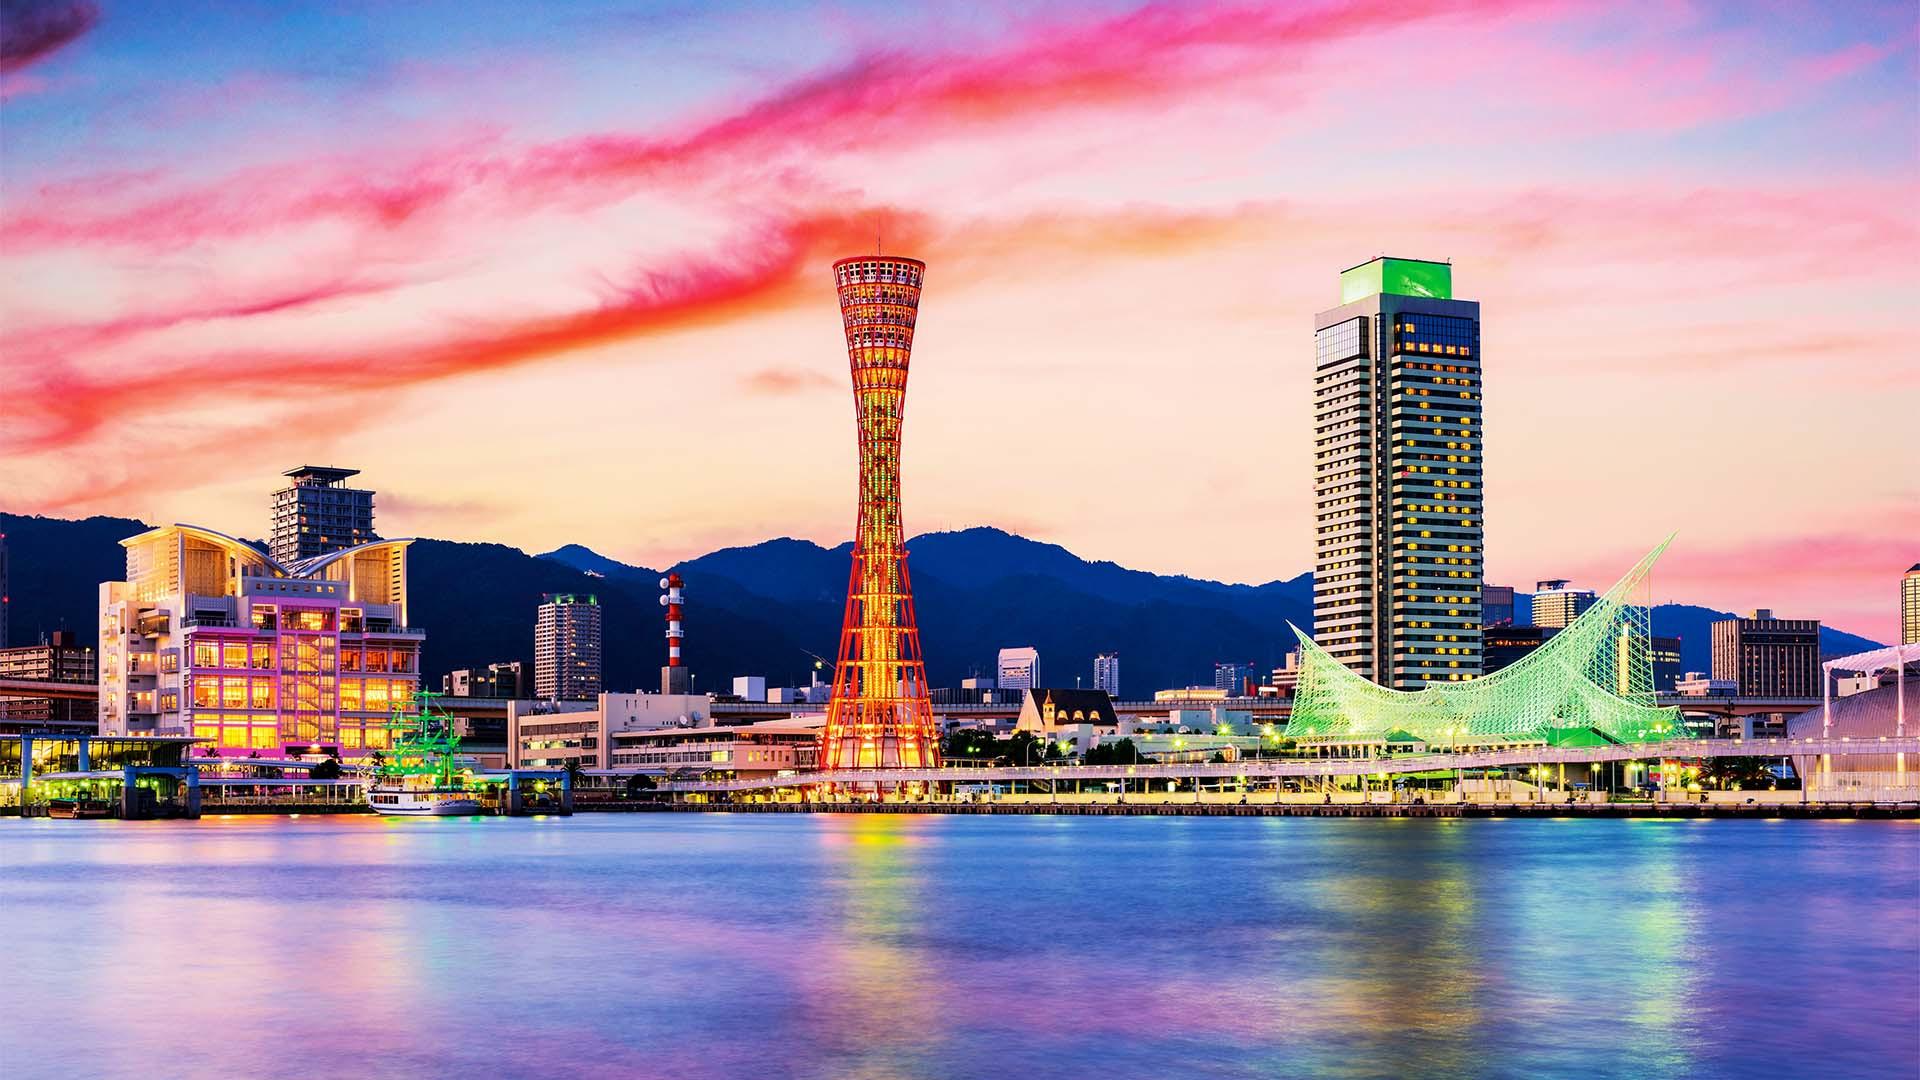 Kobe Skyline from port, Japan